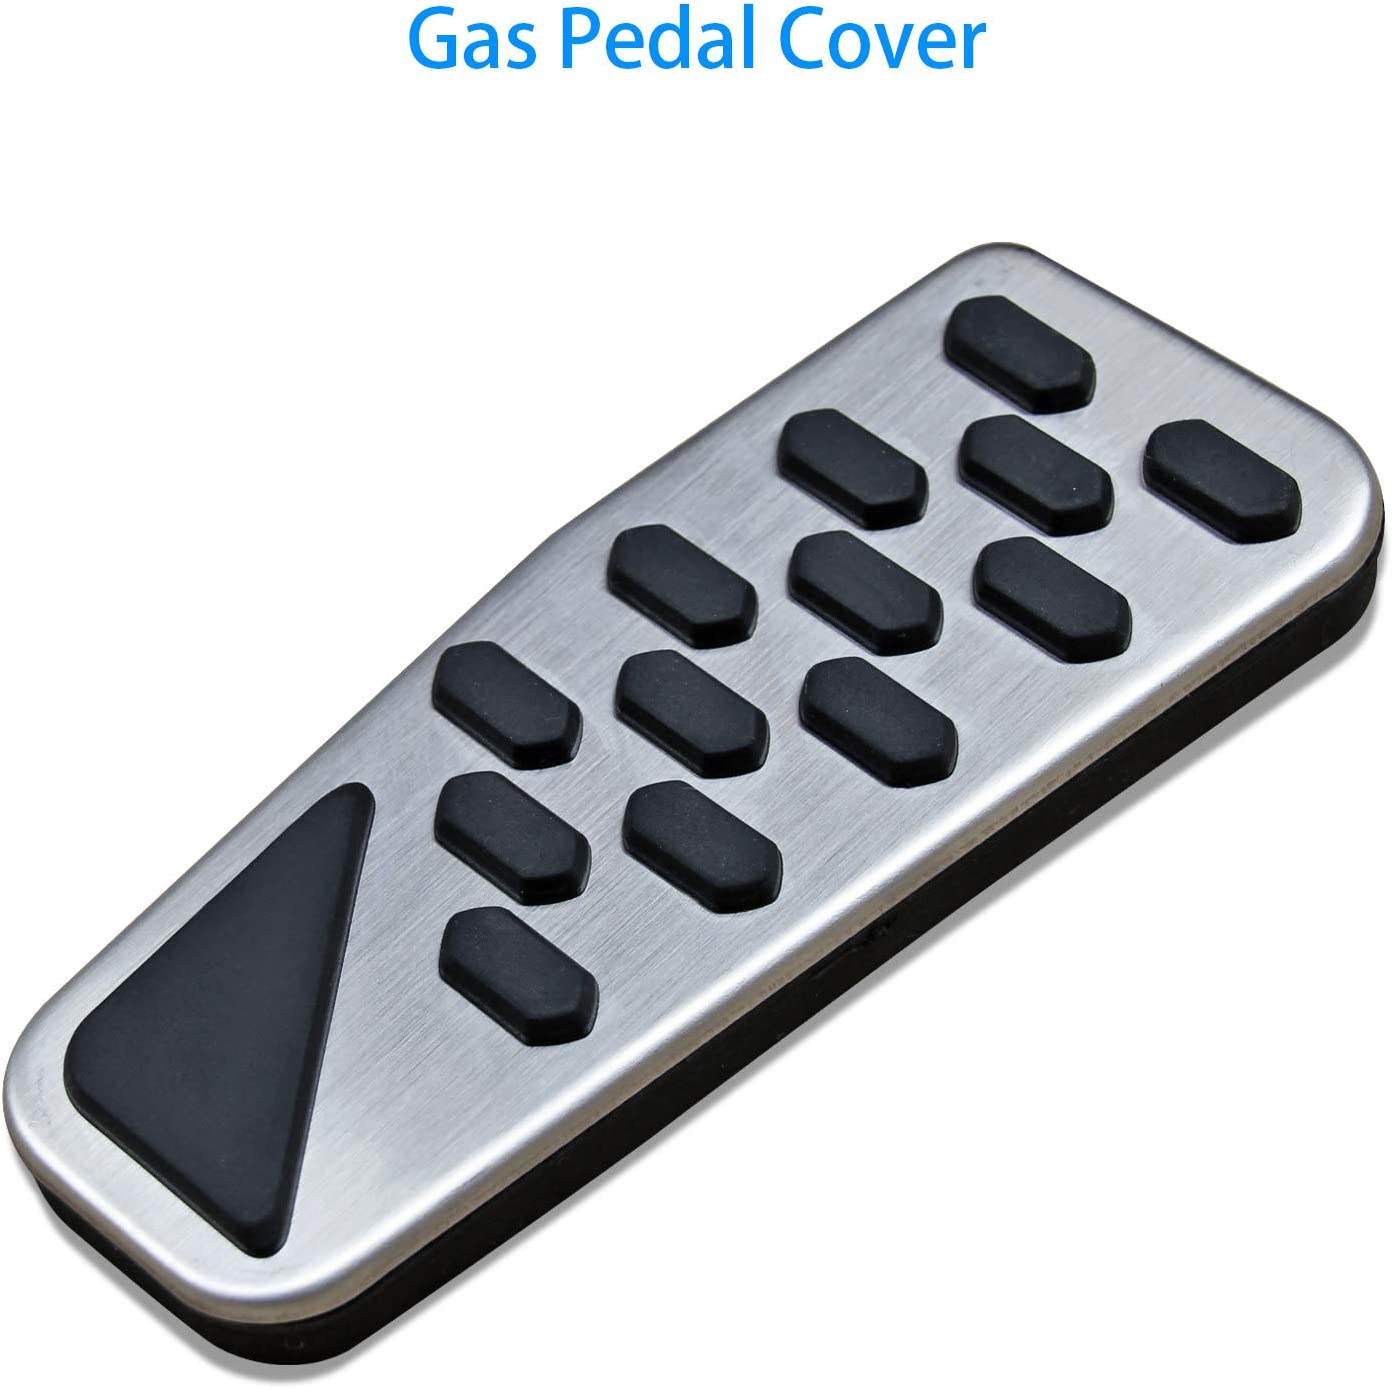 AutoBig Gas Brake Pedal Cover Set for 2019 2020 Jeep Wrangler Gladiator